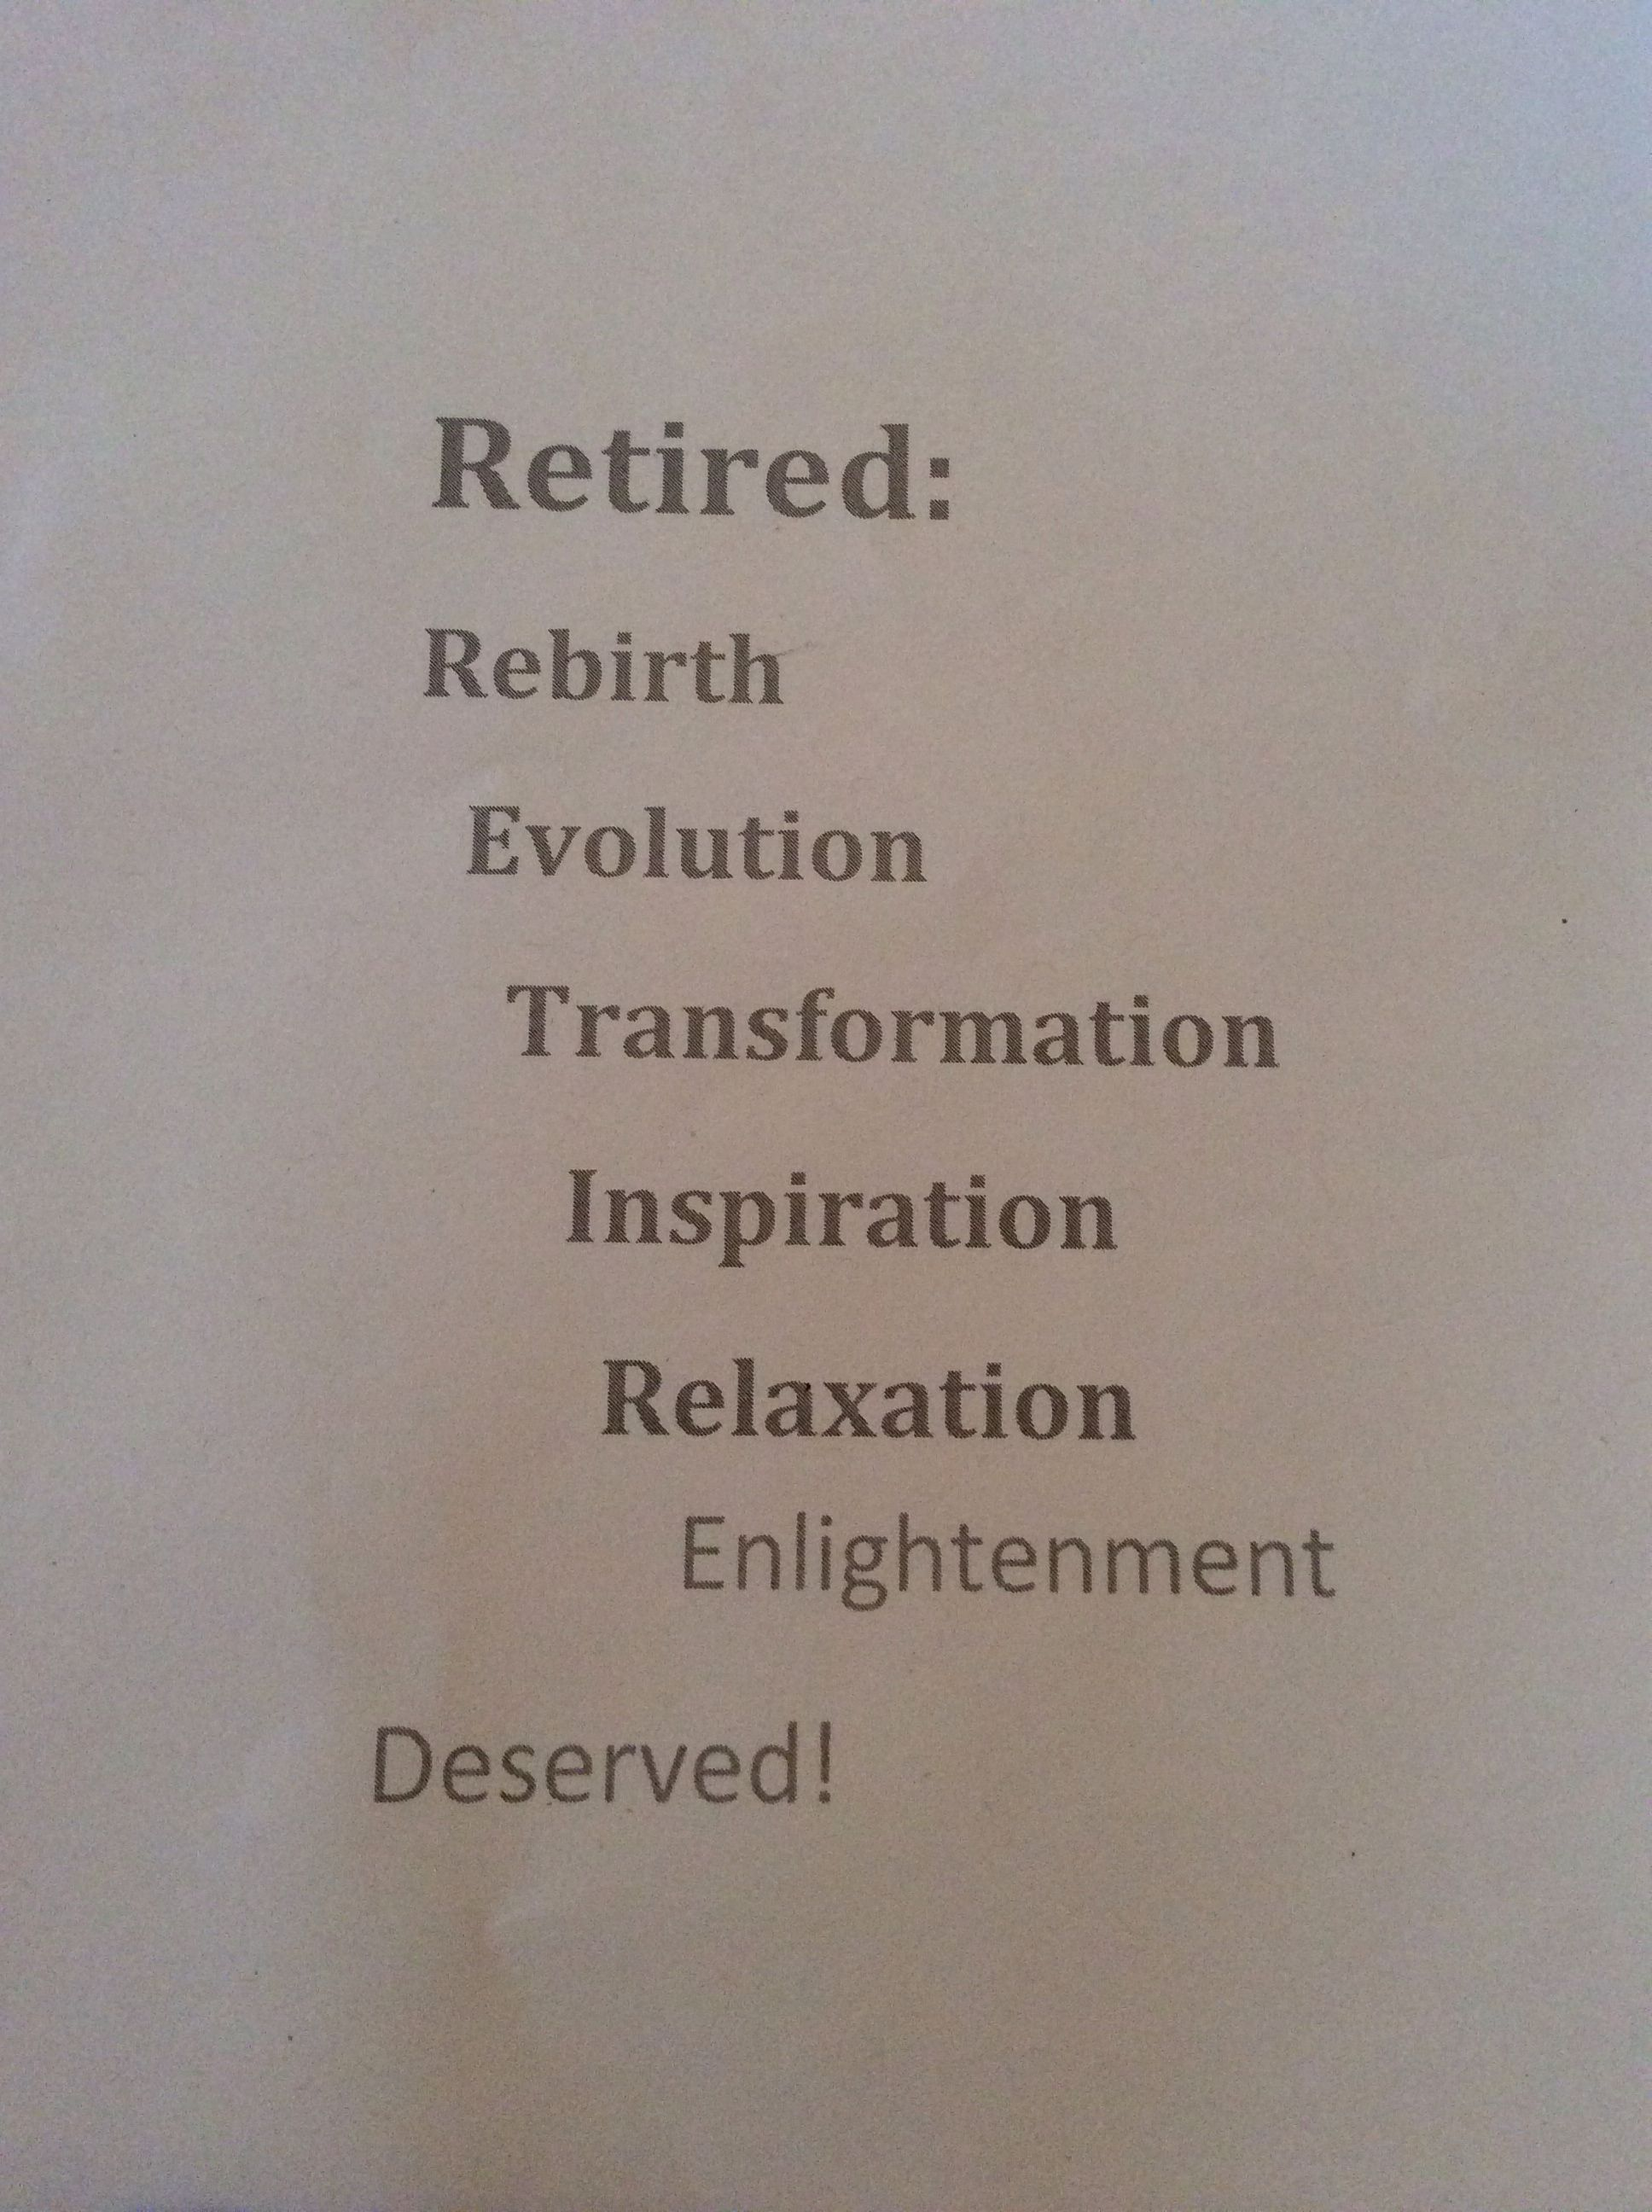 retirement card sentiment